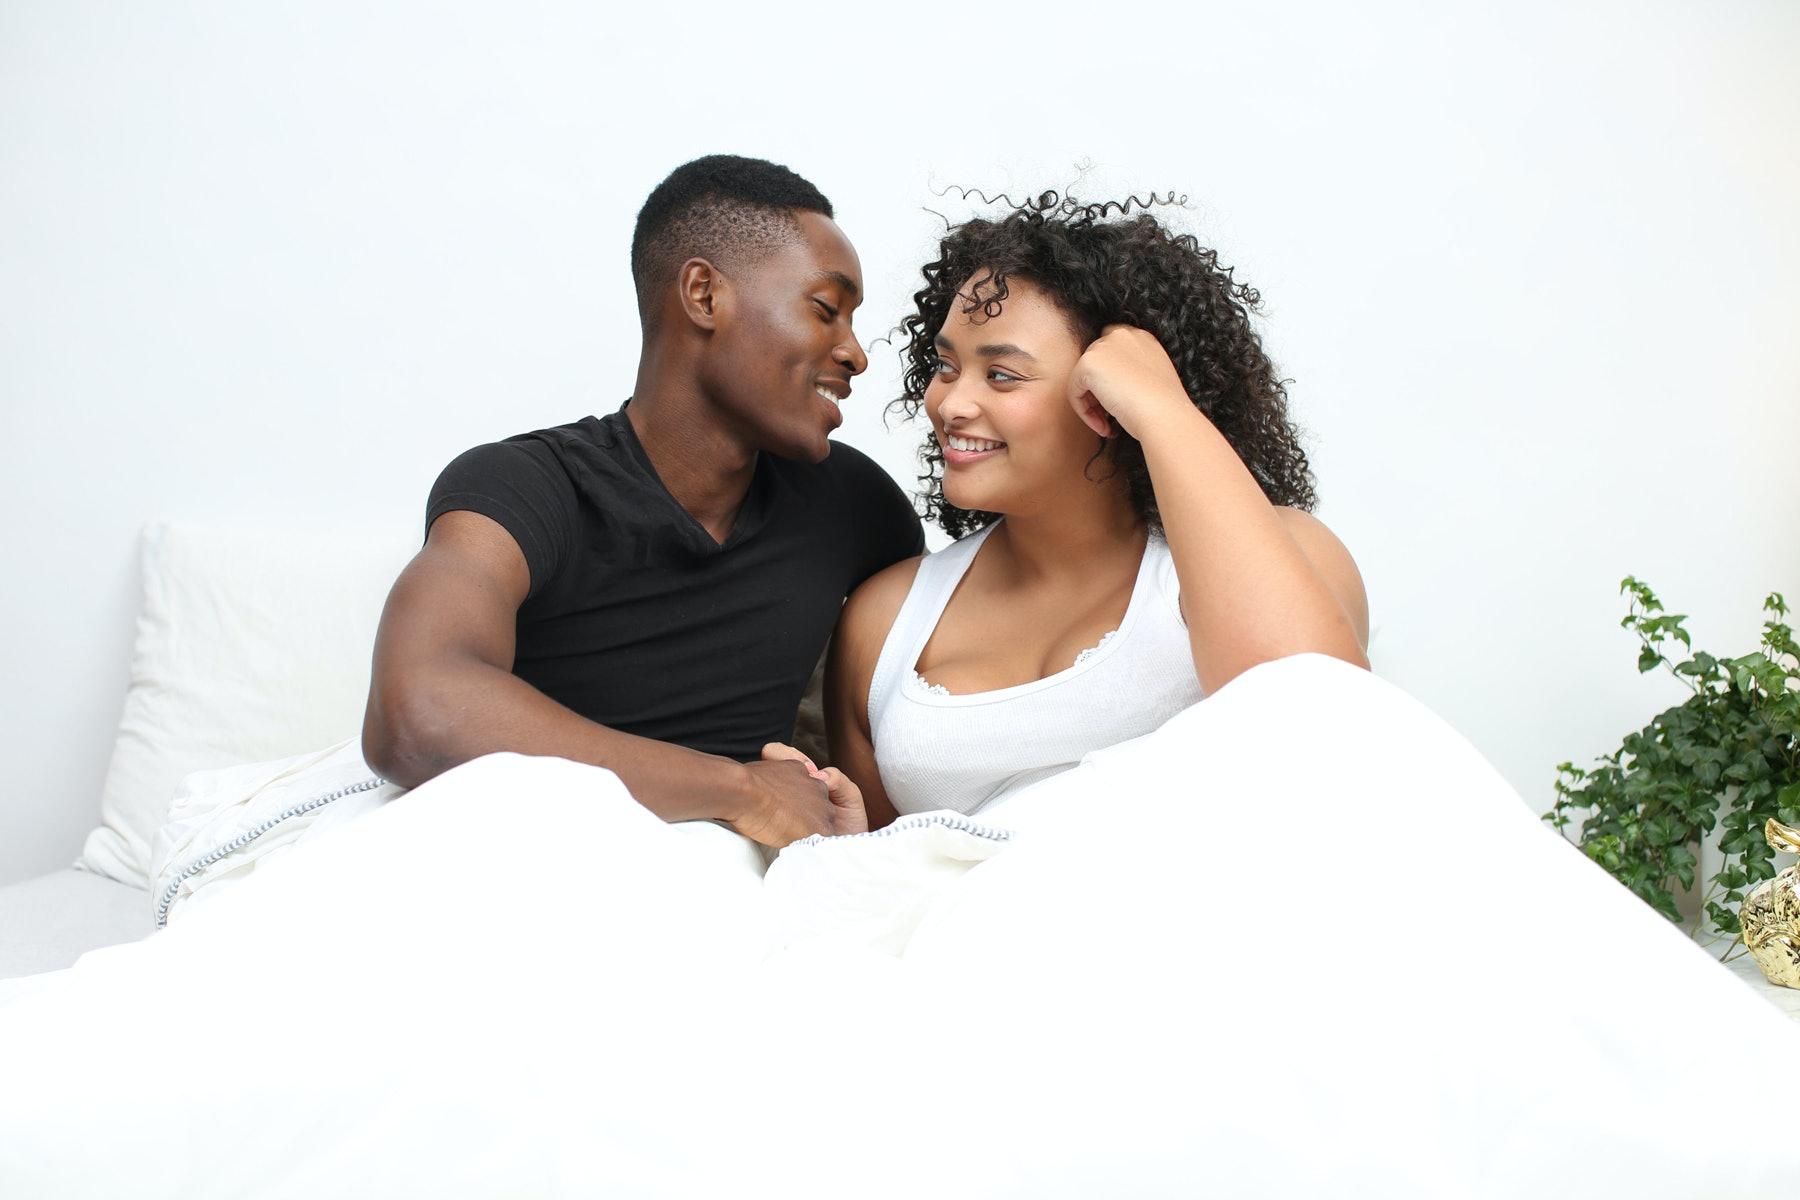 Men women Do than quicker fall love in